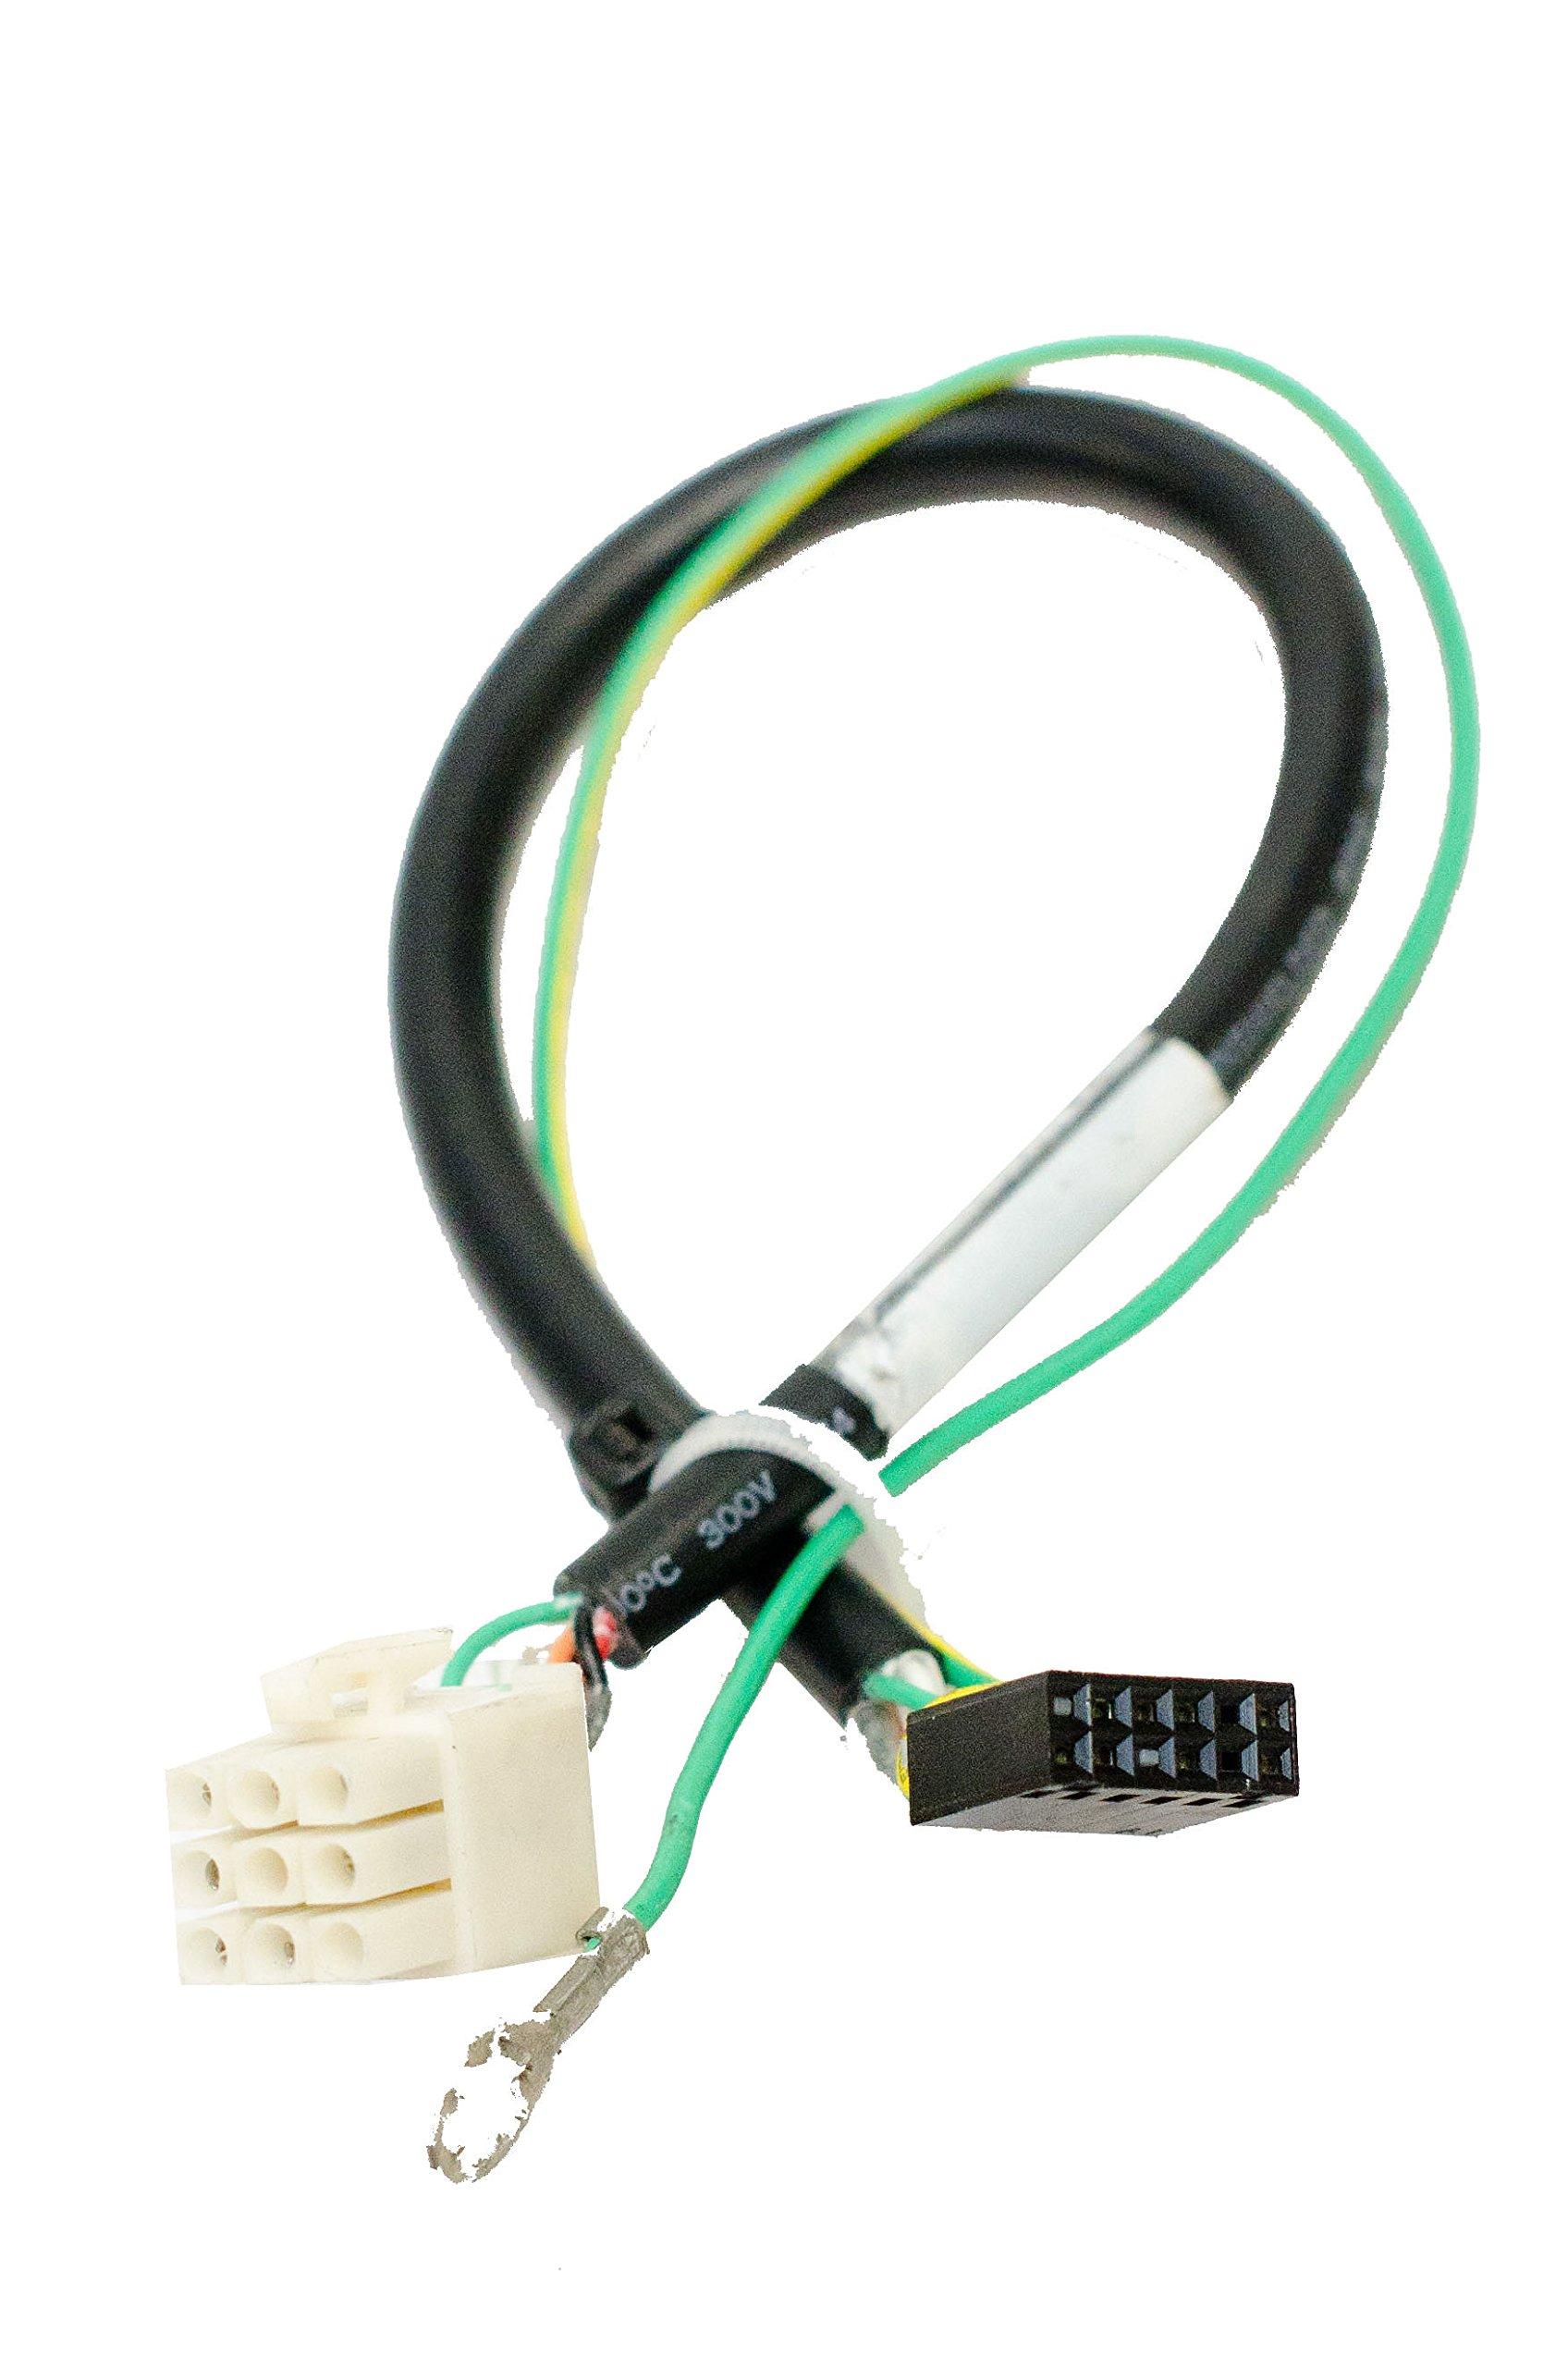 MEI VN AE 2000 series 115 Volt Bill Acceptor - Validator Harness Mfg# 250077006 by MEI